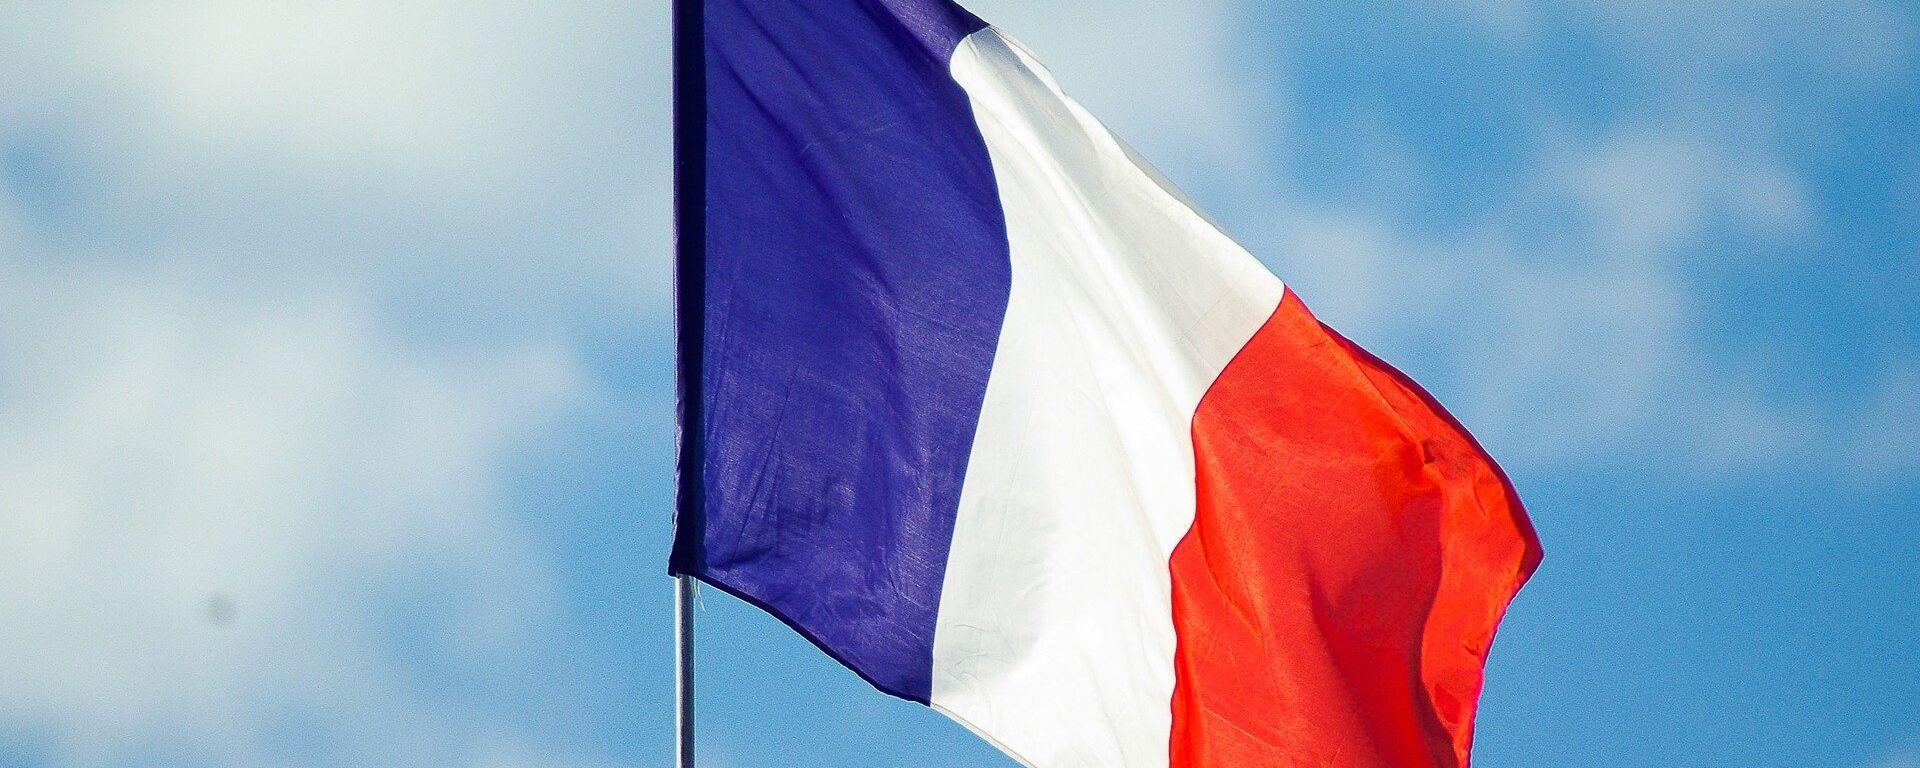 Bandera de Francia - Sputnik Mundo, 1920, 10.03.2021